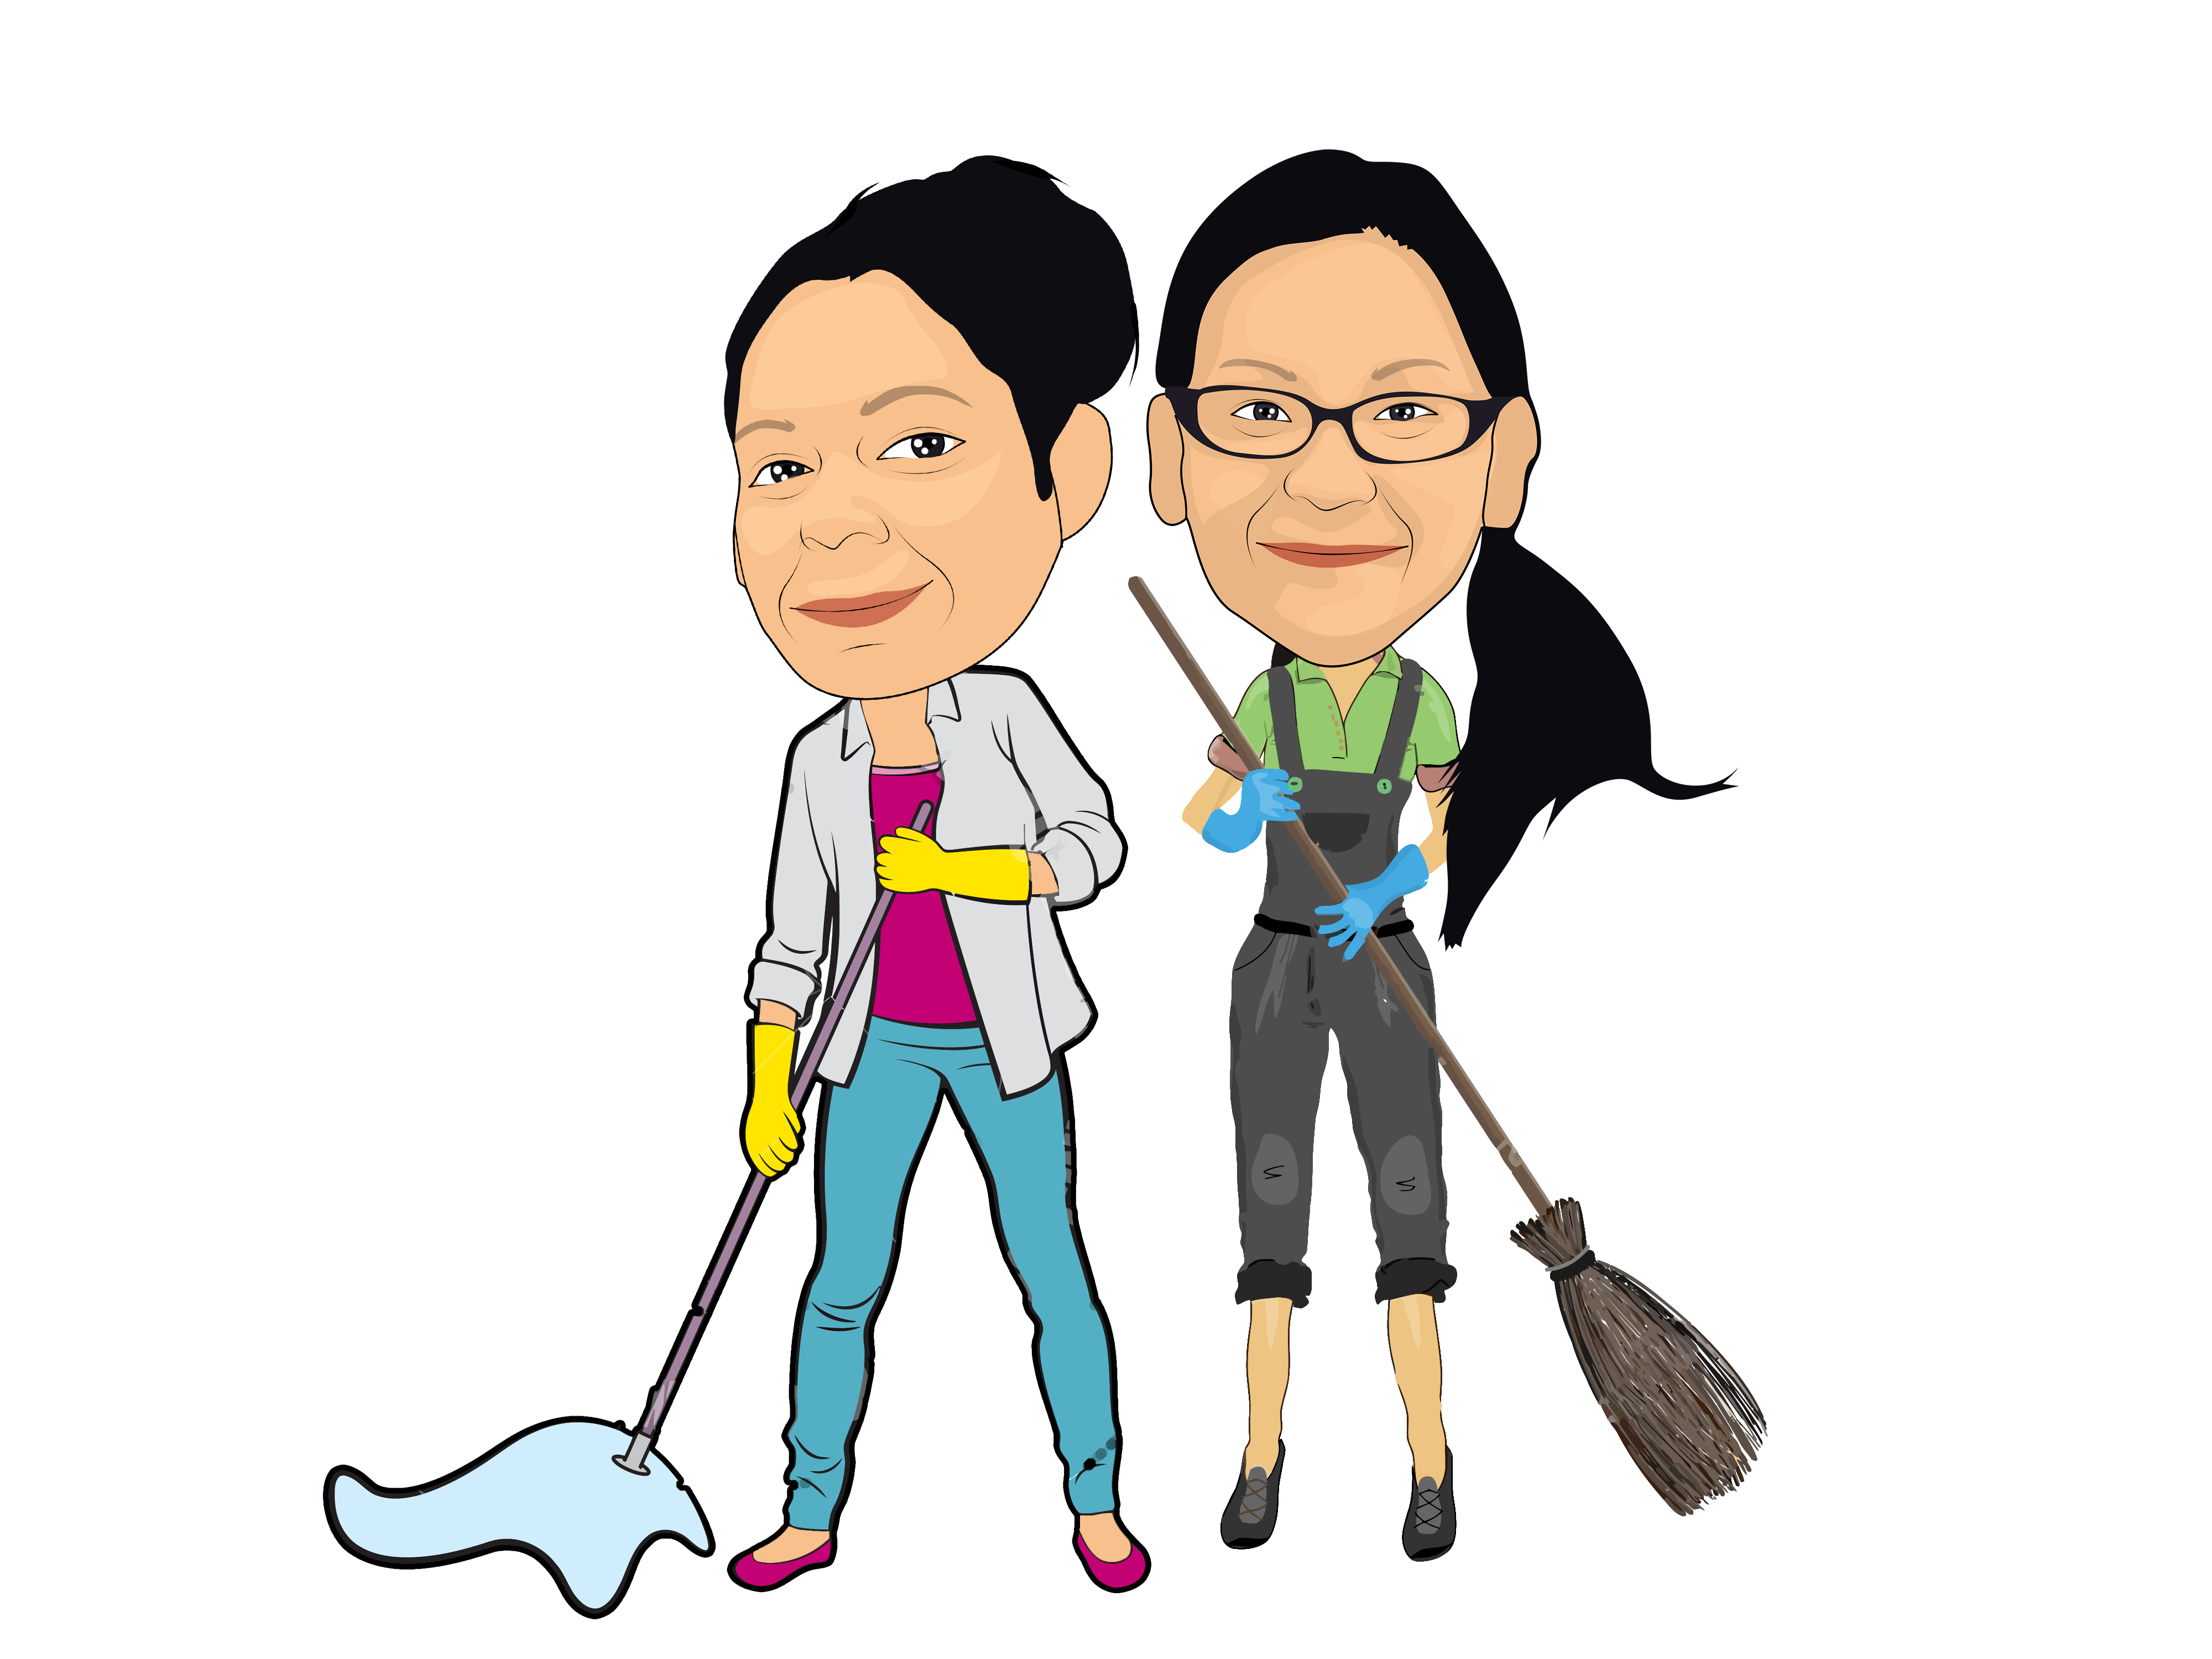 About get er . Maid clipart mop floor